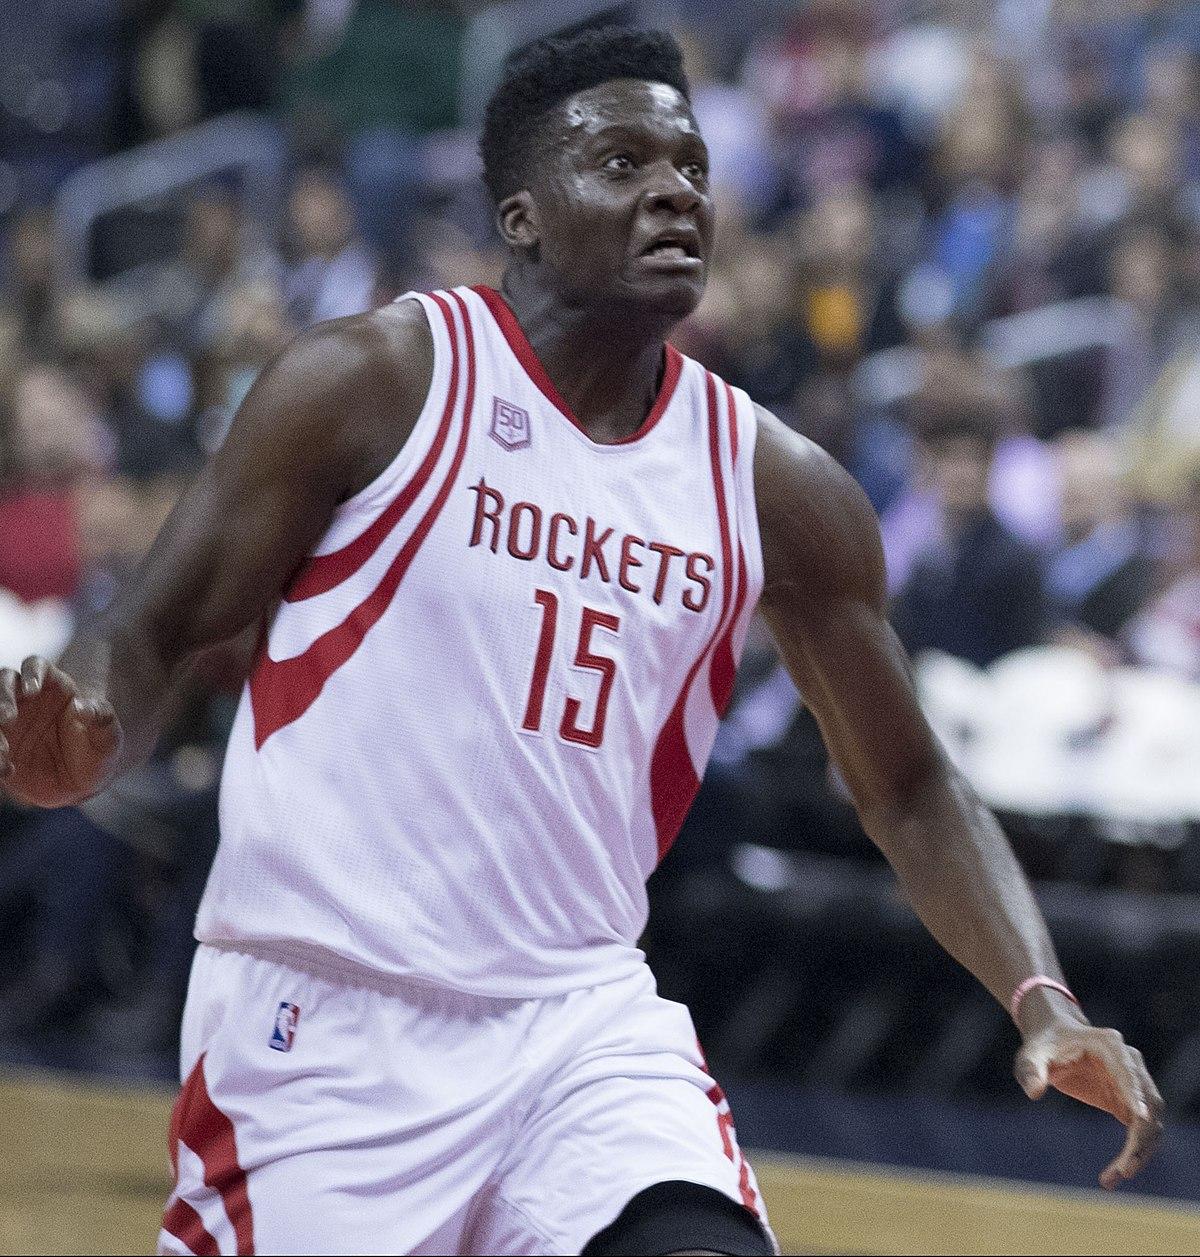 Houston Rockets Depth Chart: Clint Capela